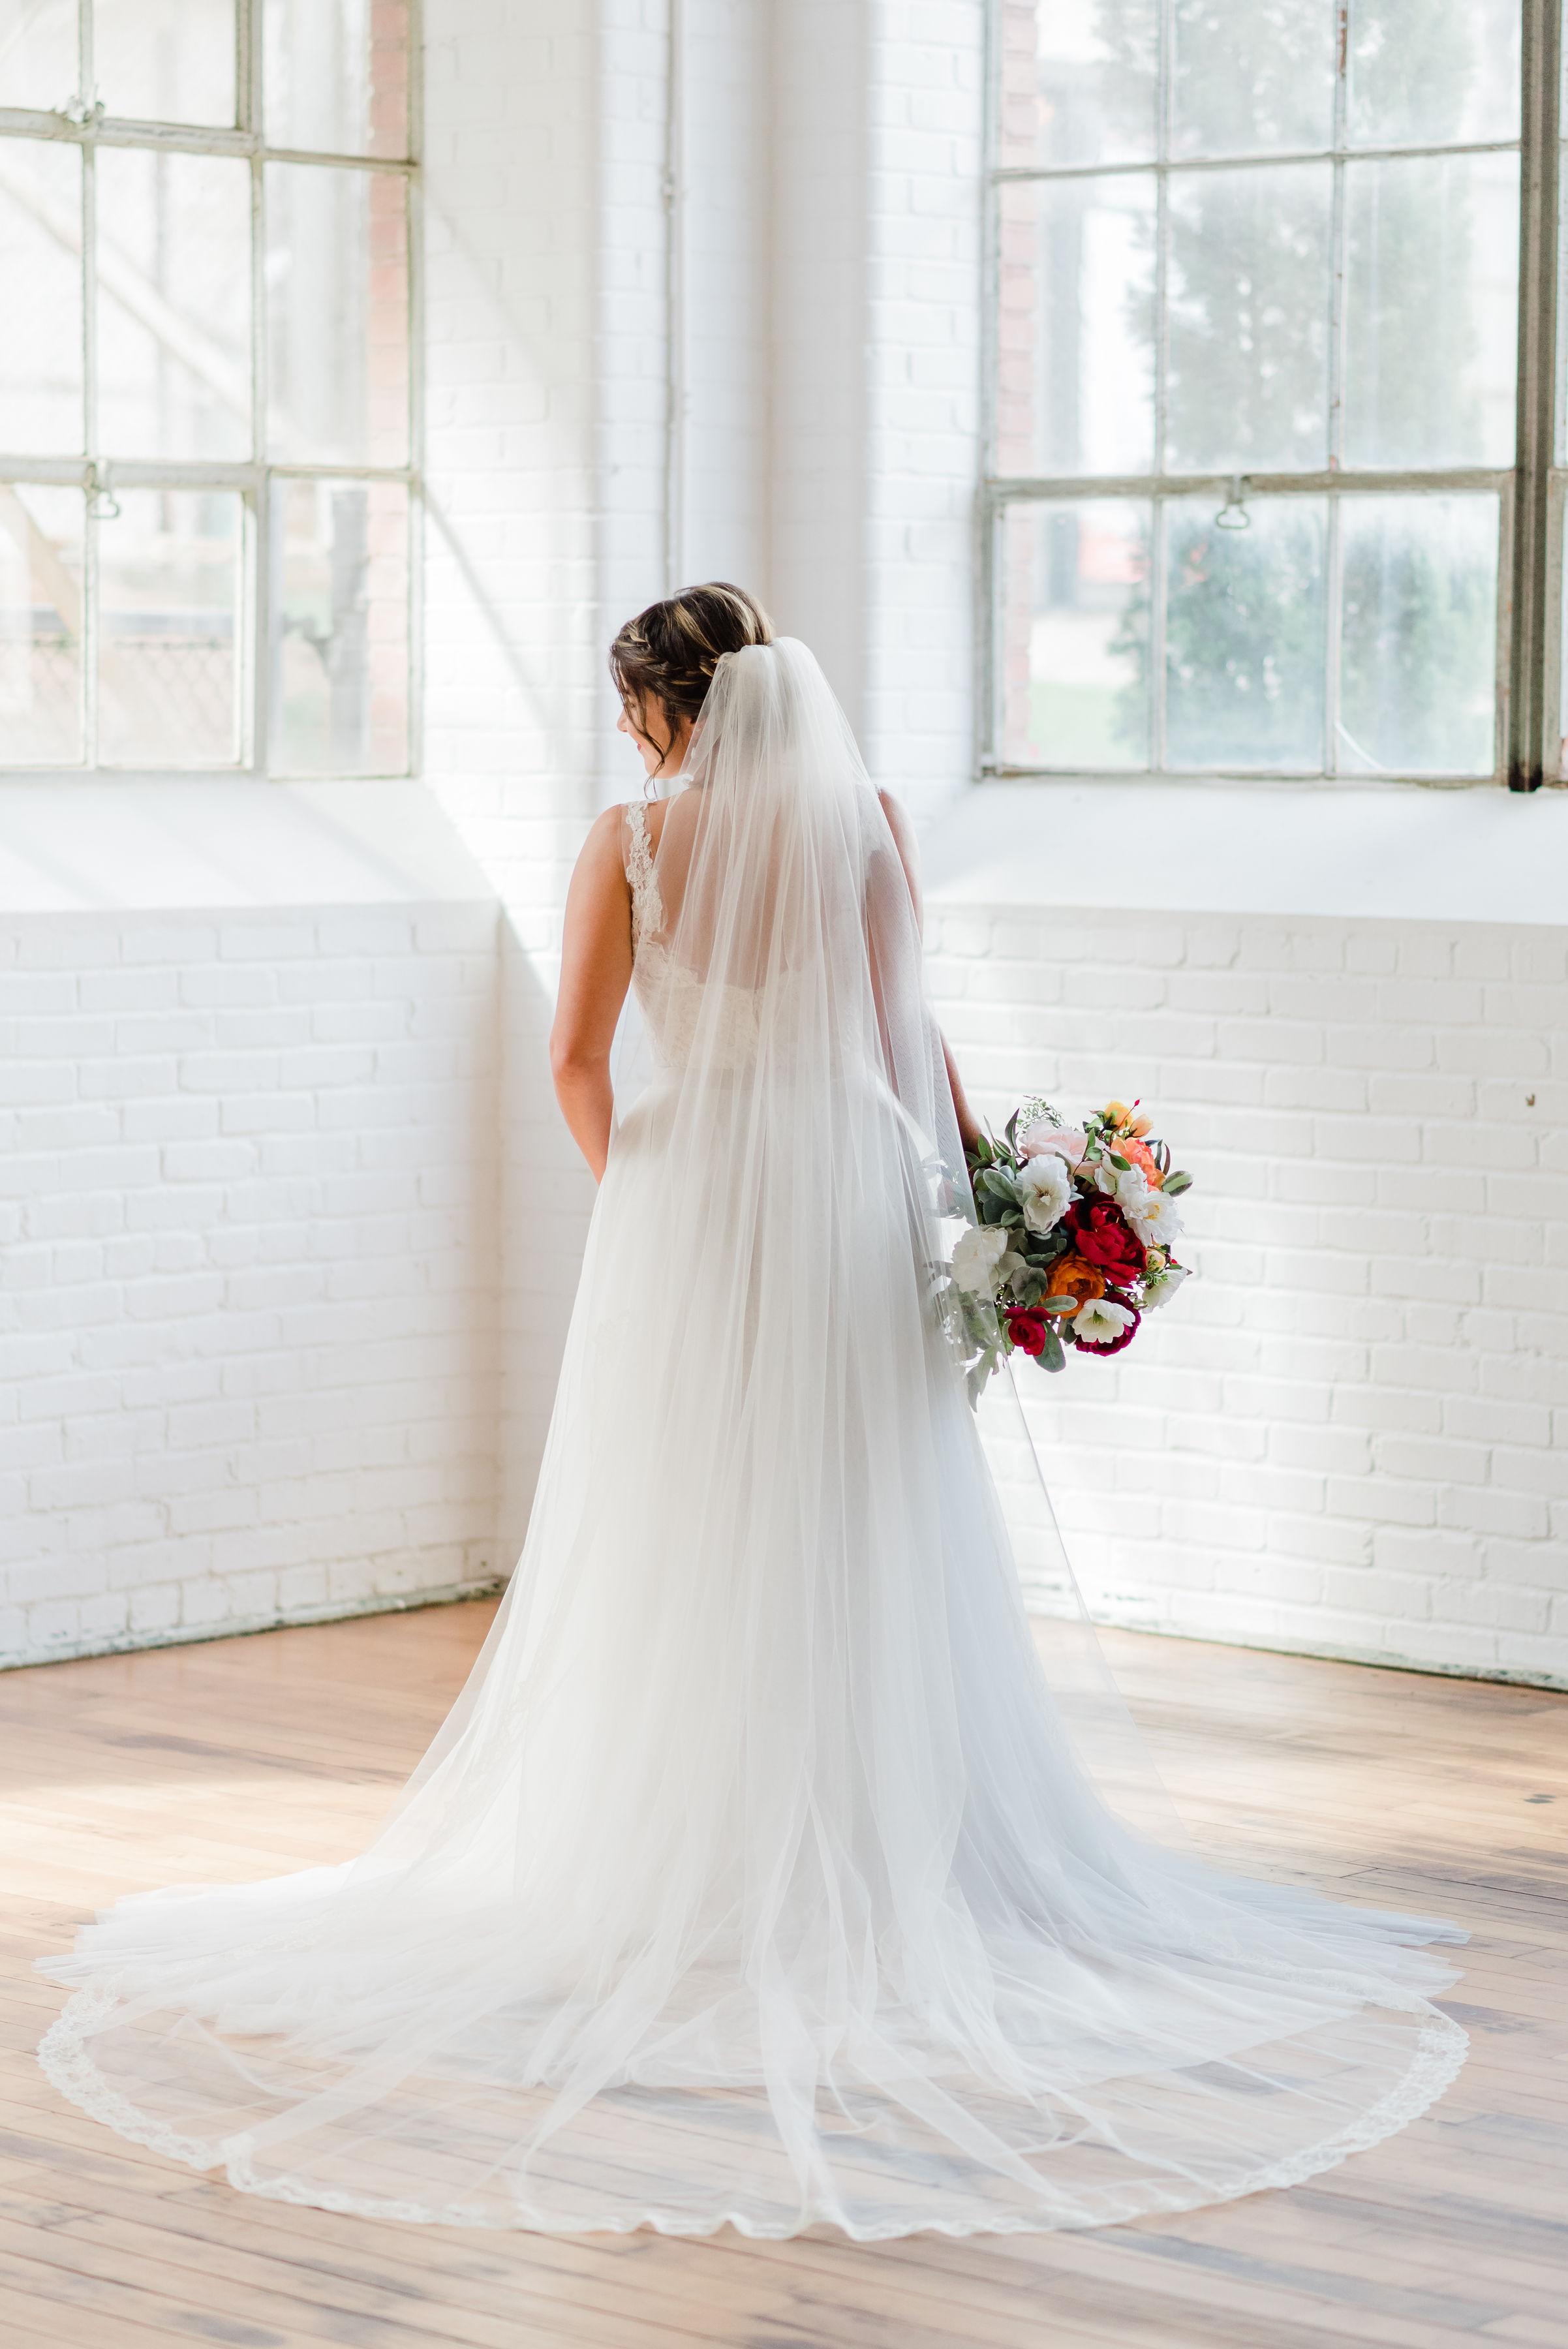 TaylorAdams_bridals-99.jpg